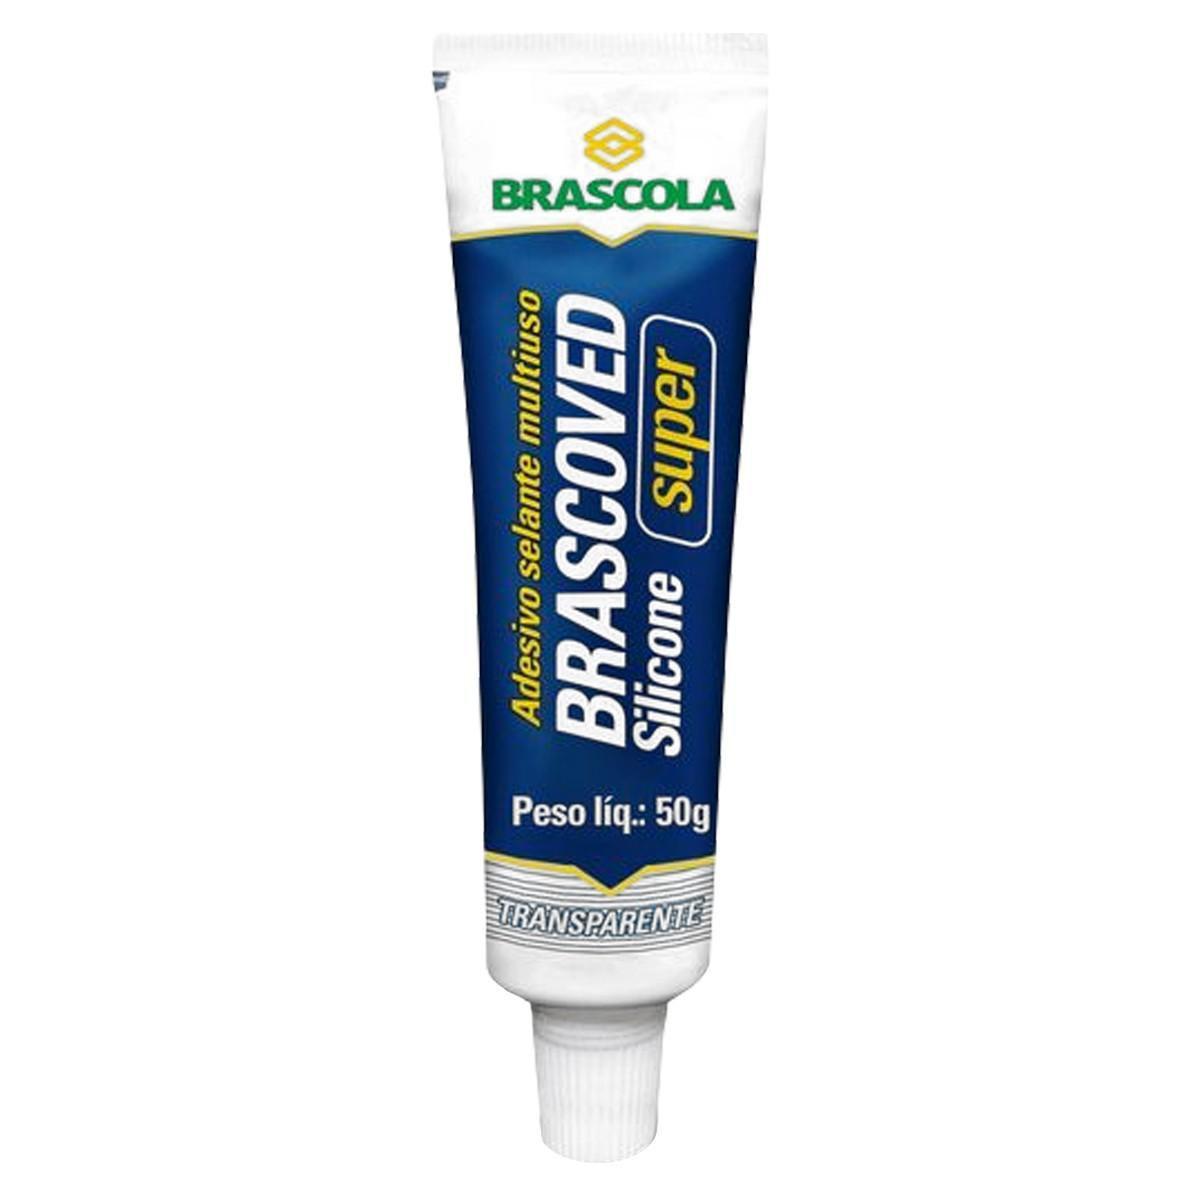 Silicone Brascoved Super Transparente 50Gr Brascola